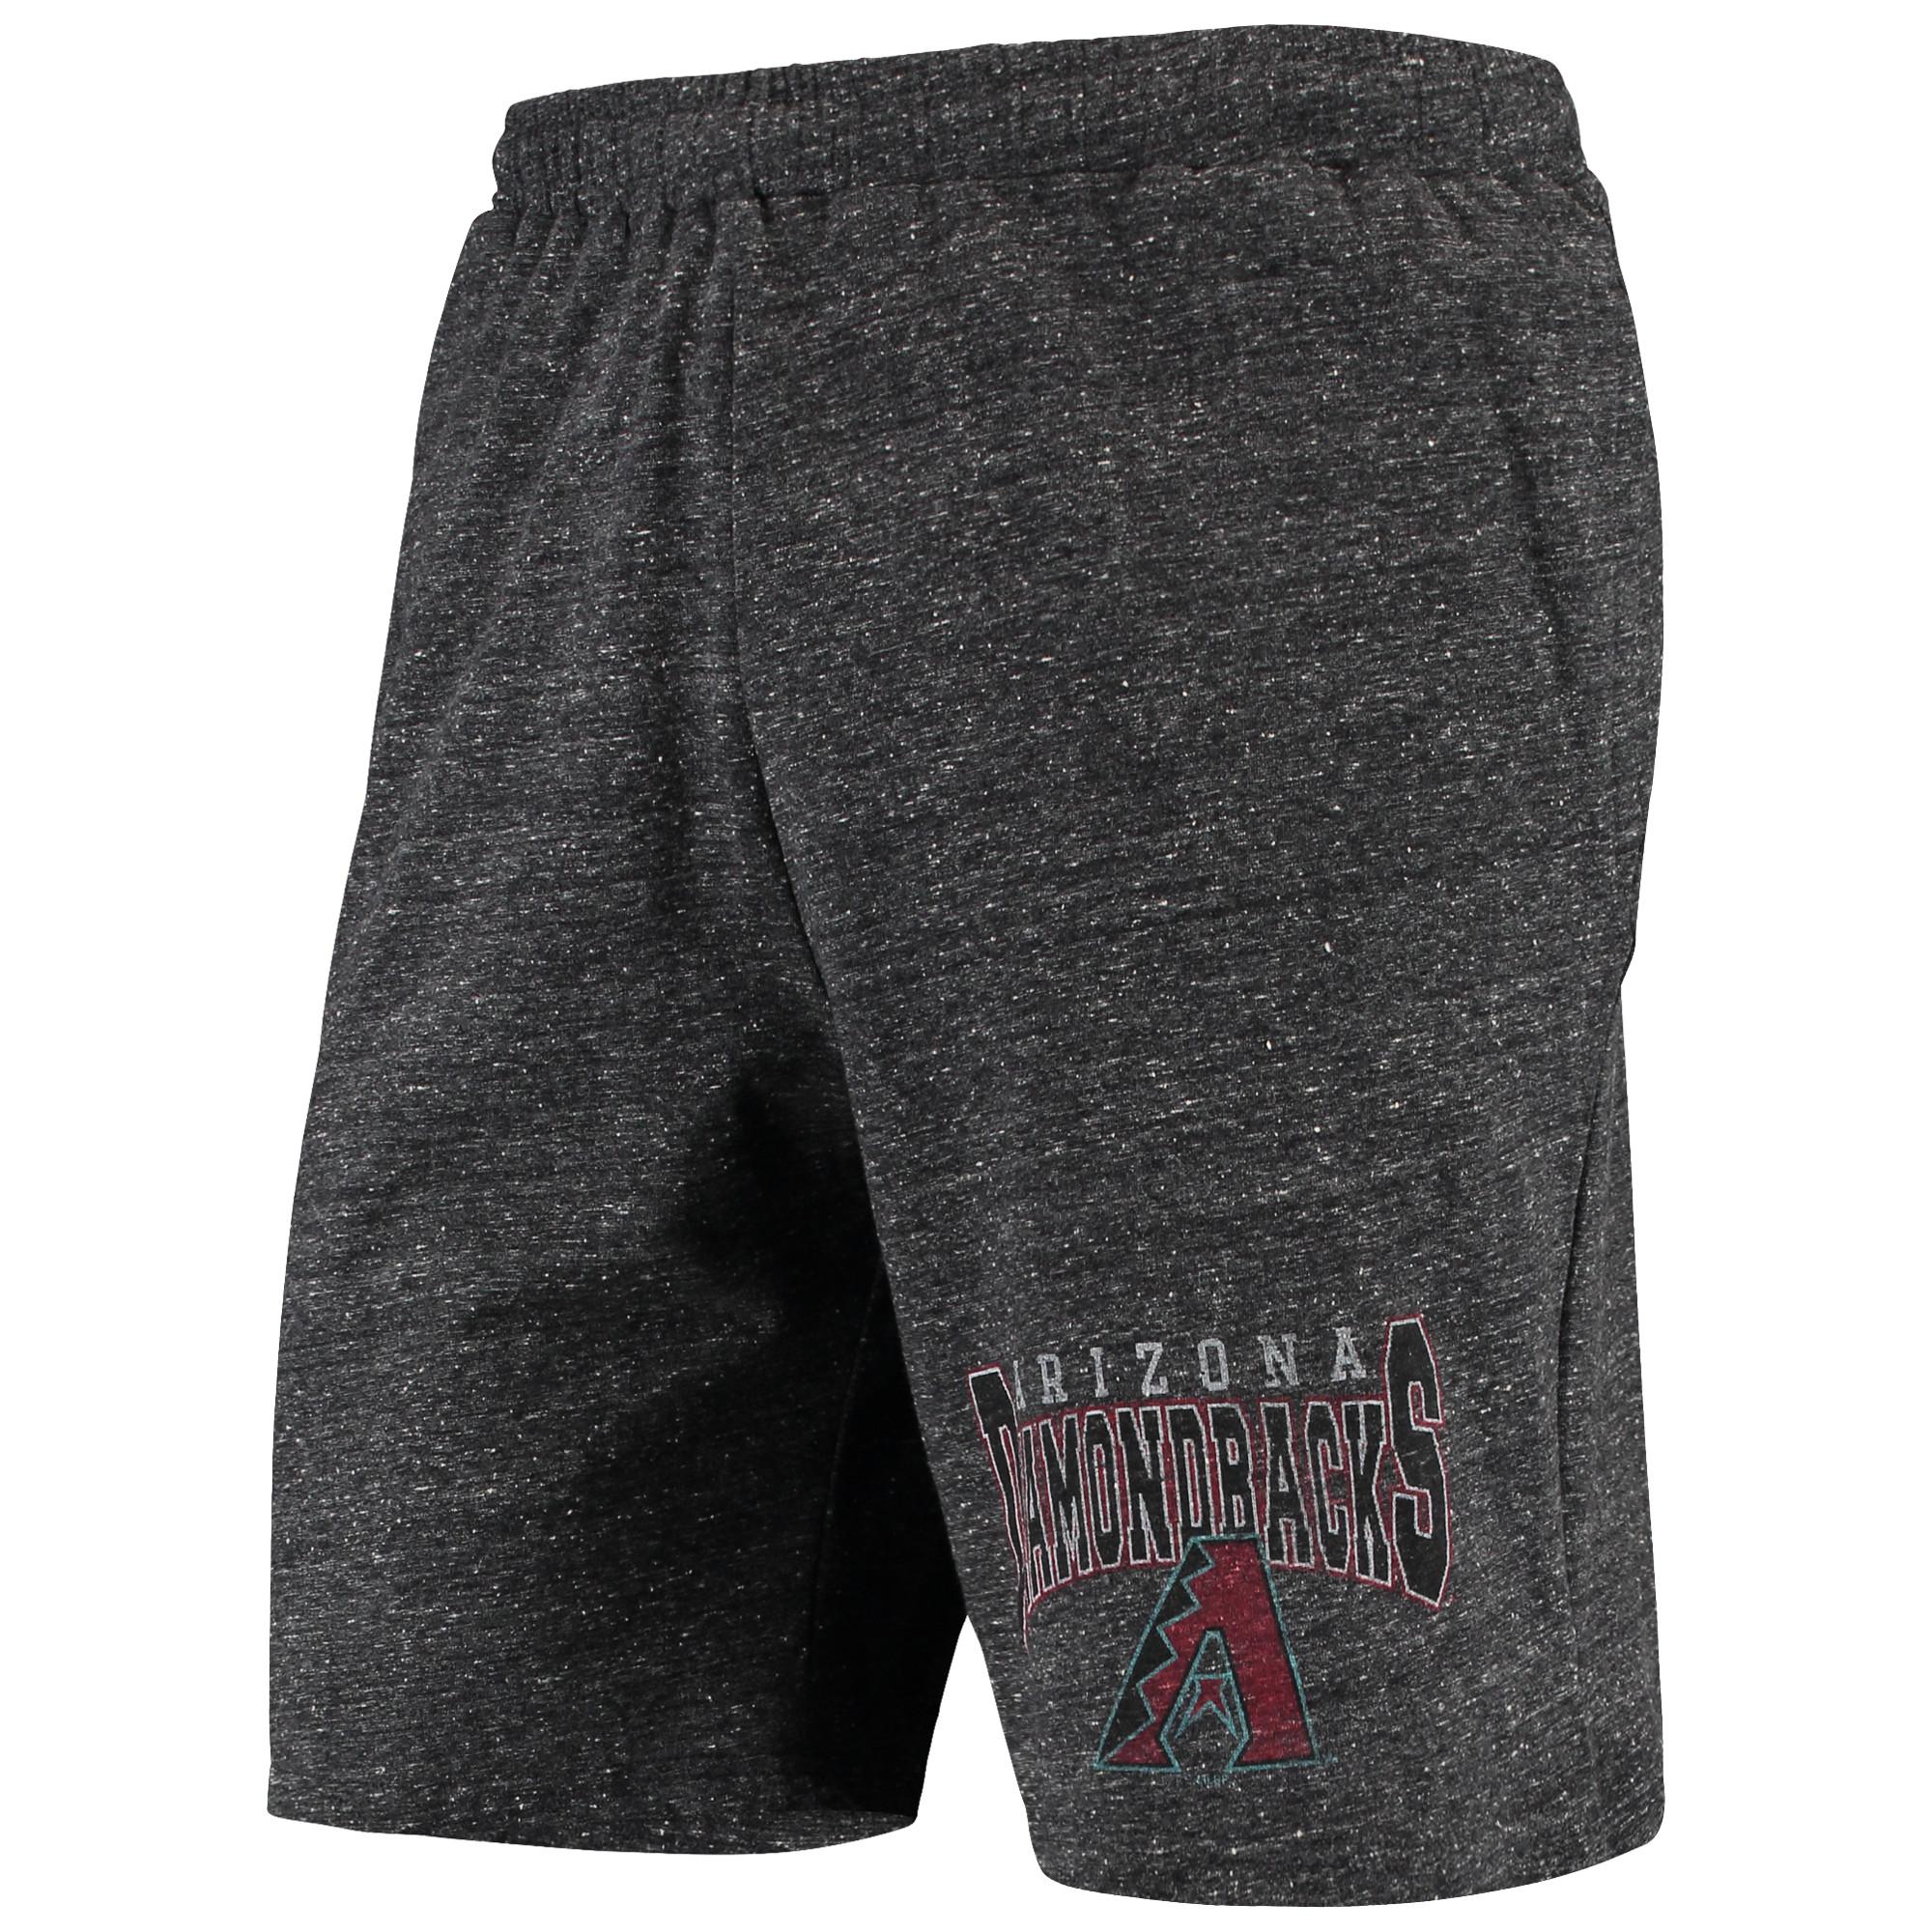 Arizona Diamondbacks Concepts Sport Pitch Shorts - Charcoal